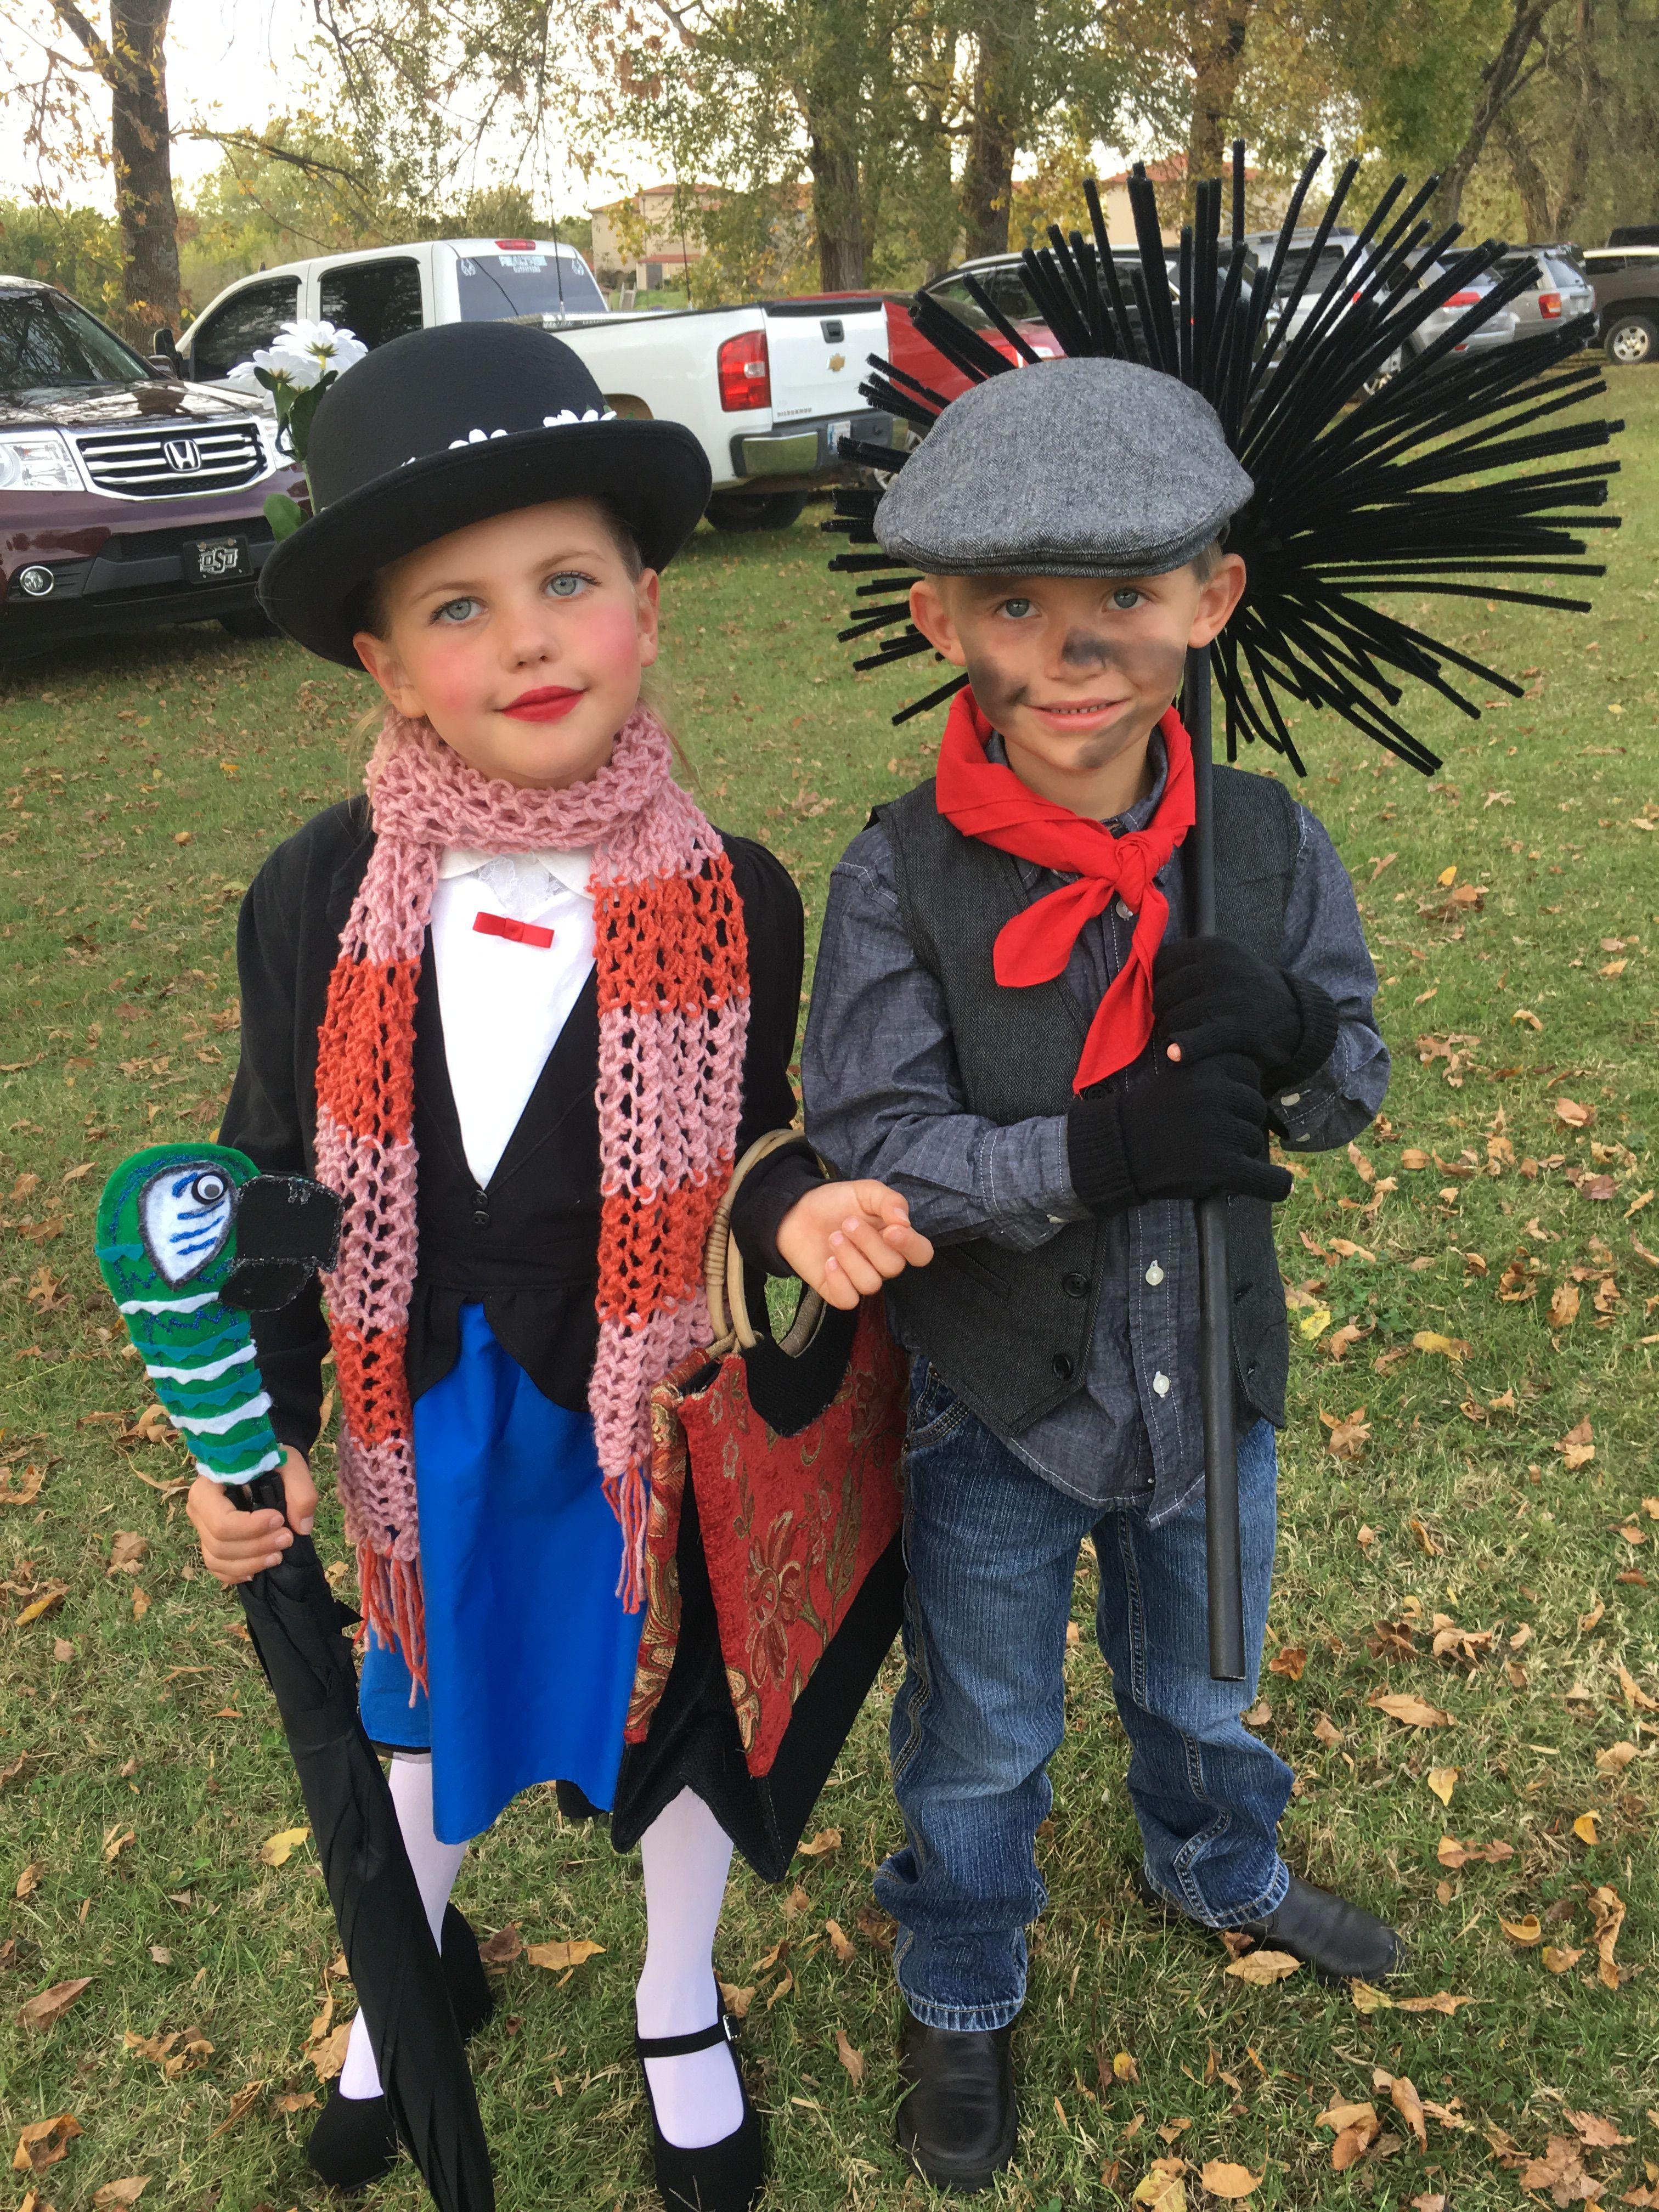 best cutest kids halloween costume diy mary poppins bert the chimney sweep 1st place winners